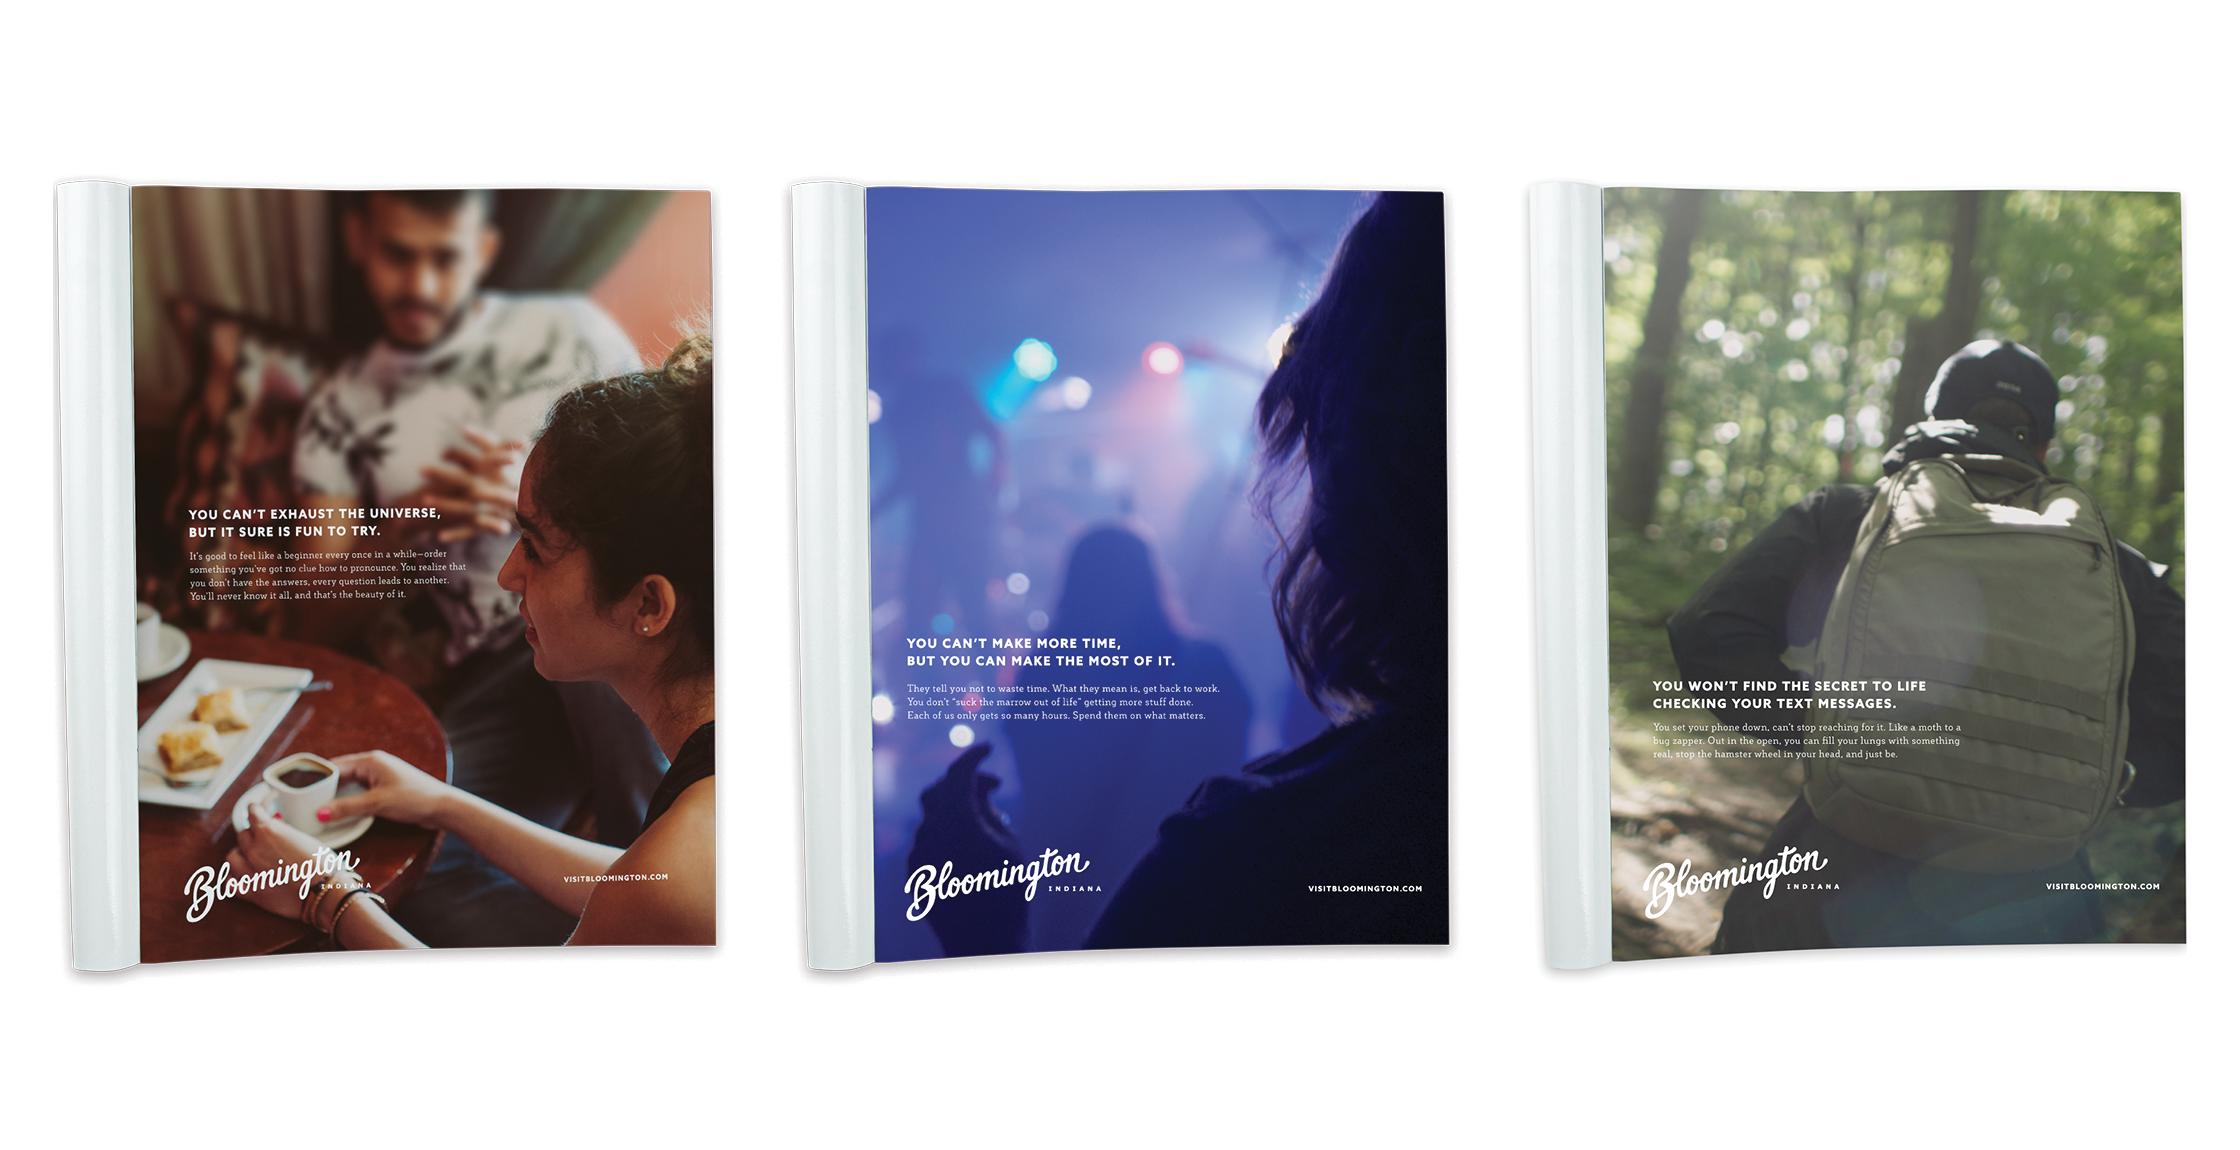 Visit Bloomington Print Advertising